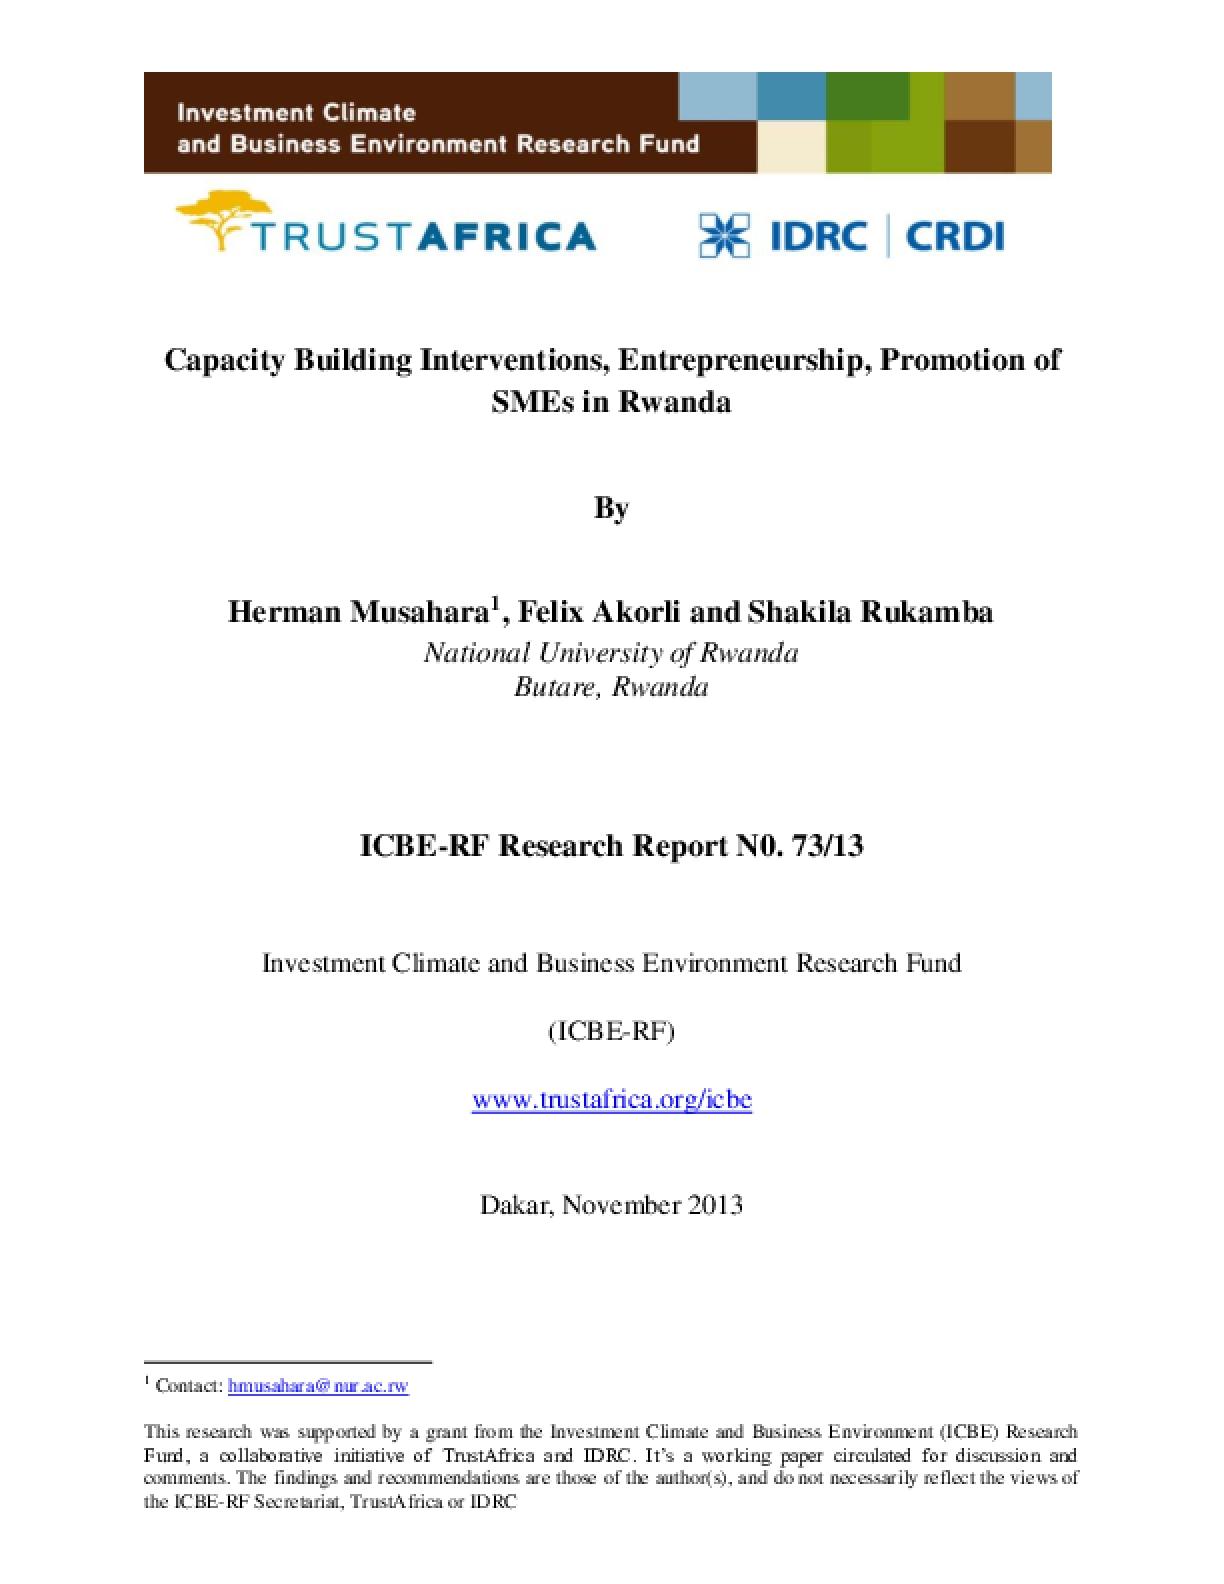 Capacity Building Interventions, Entrepreneurship, Promotion of SMEs in Rwanda